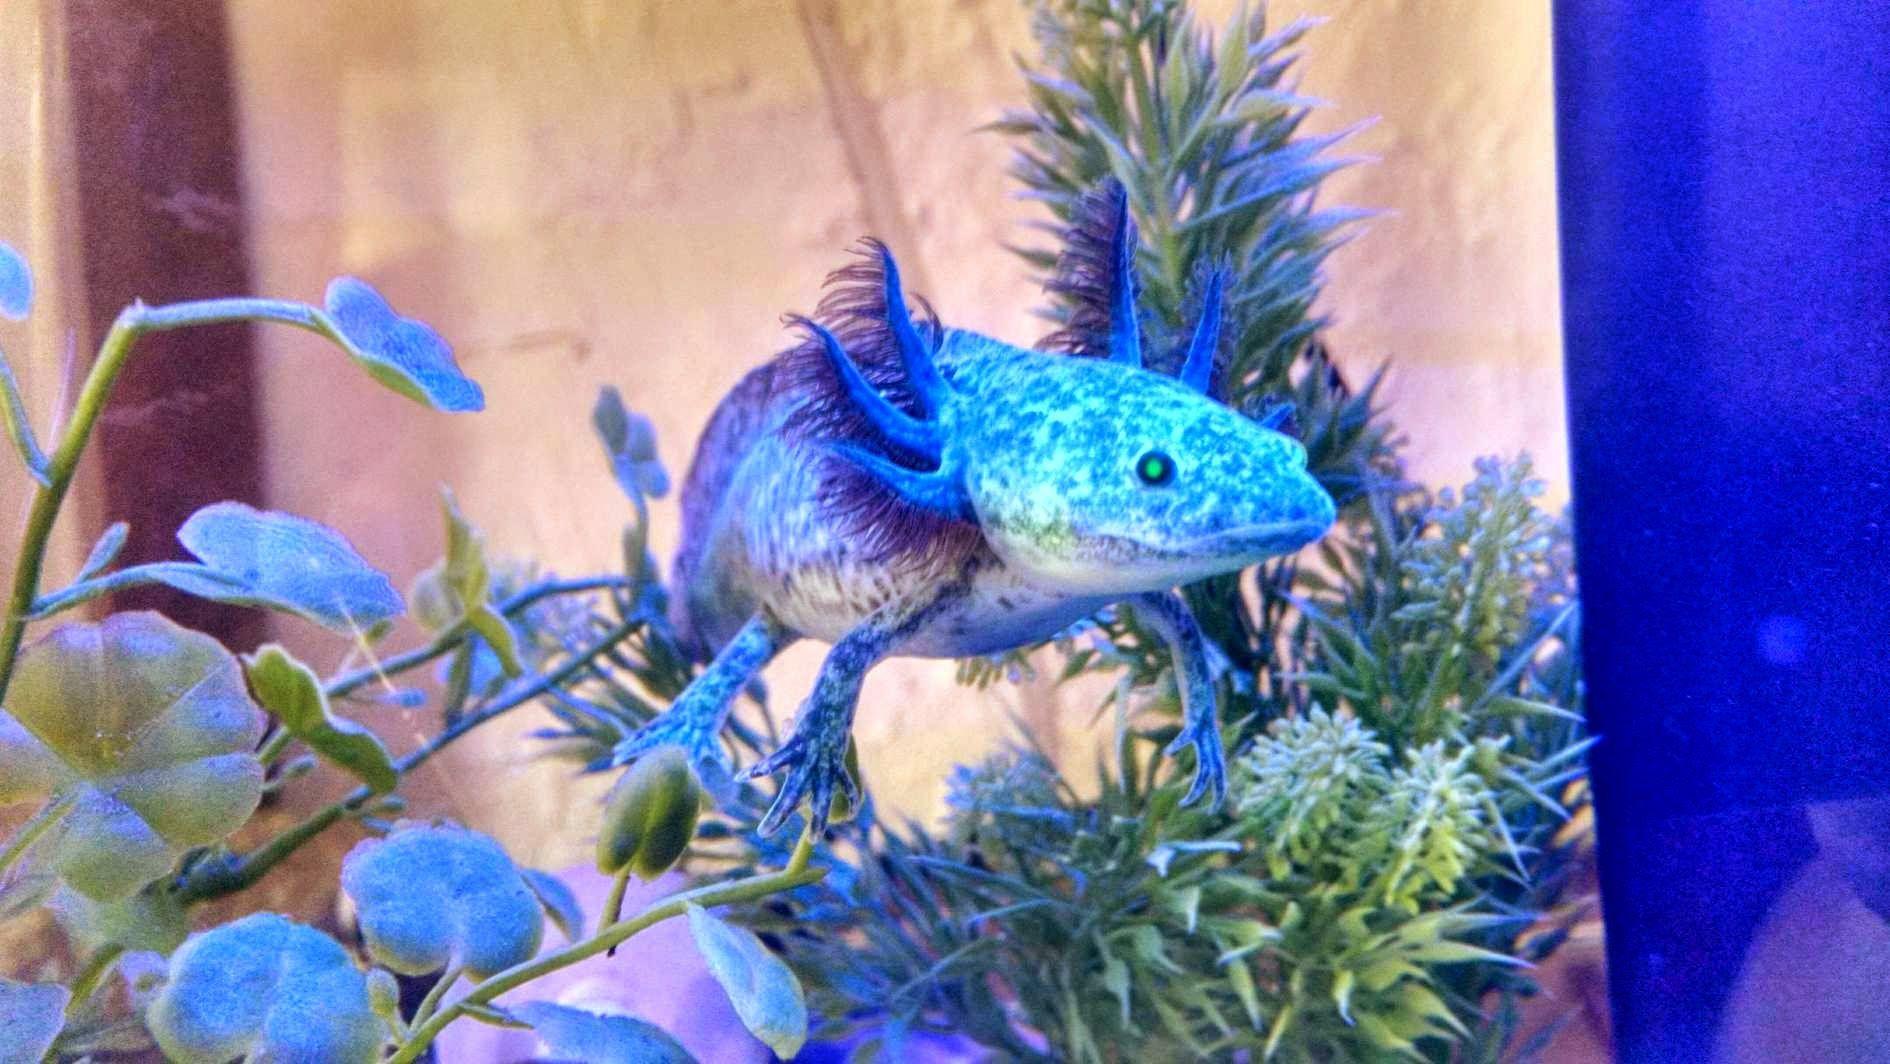 Gfp Purple Axolotl Under Blue Led